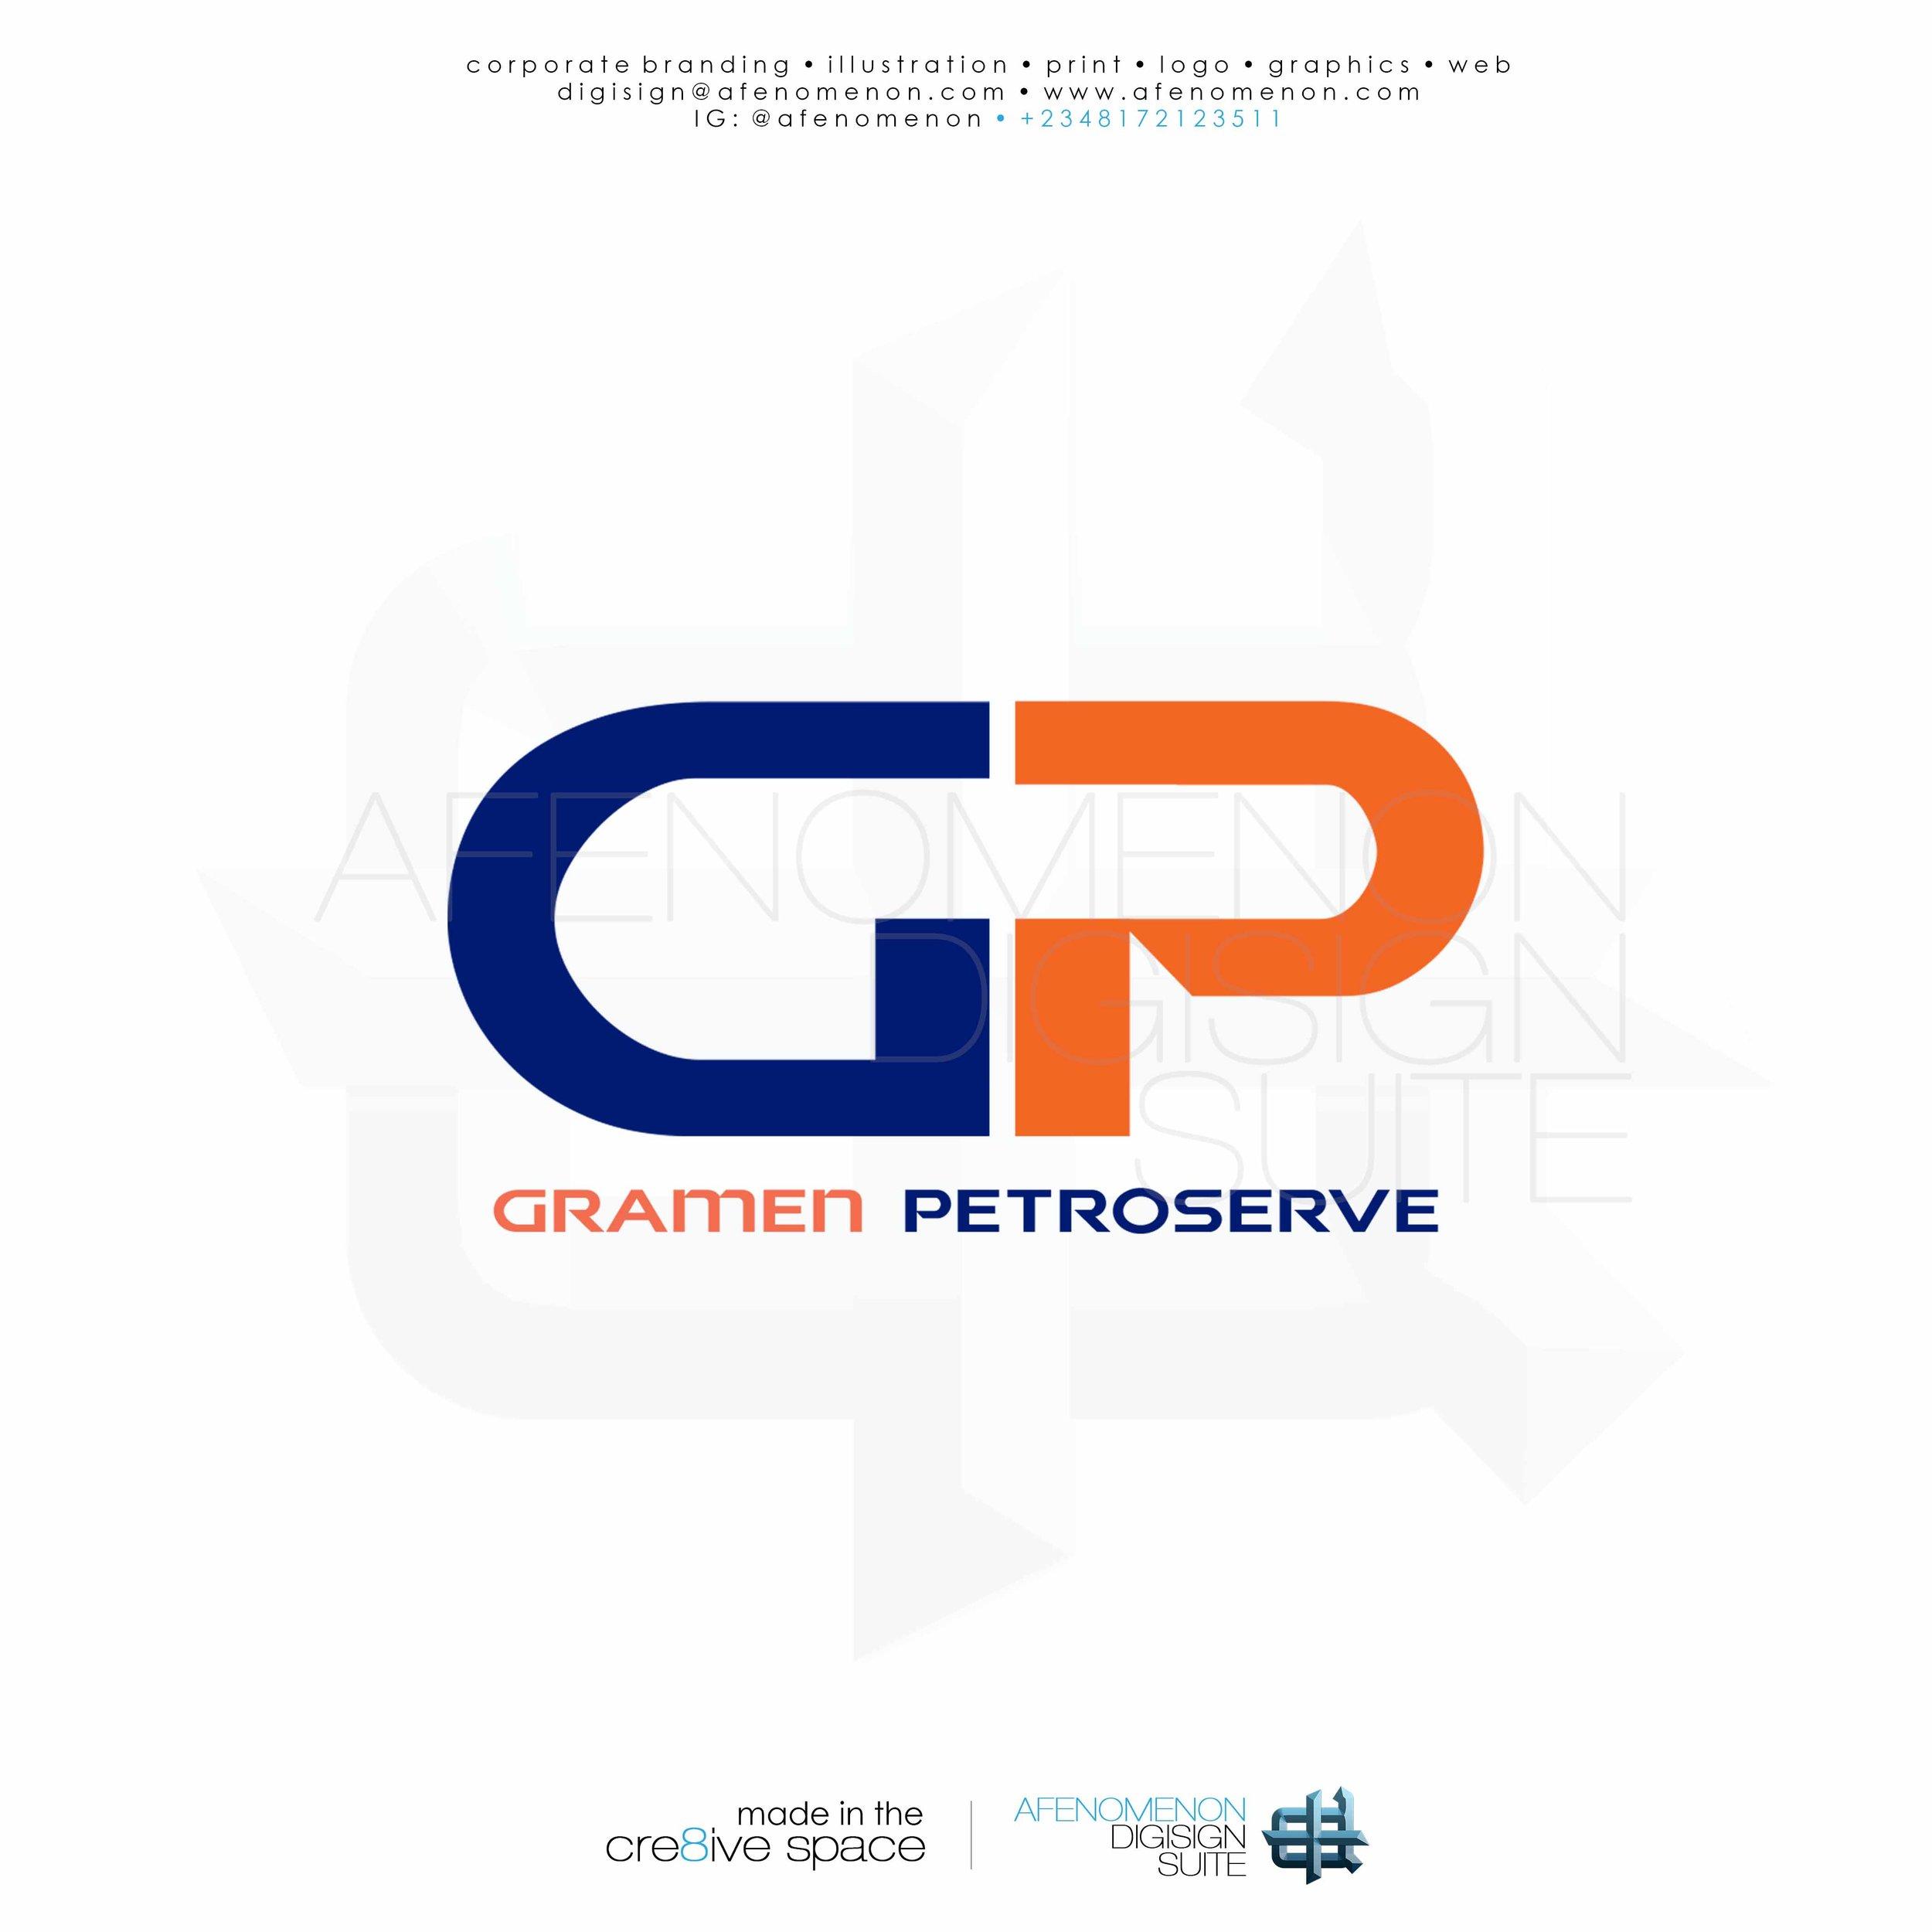 Gramen Petroserve.jpg